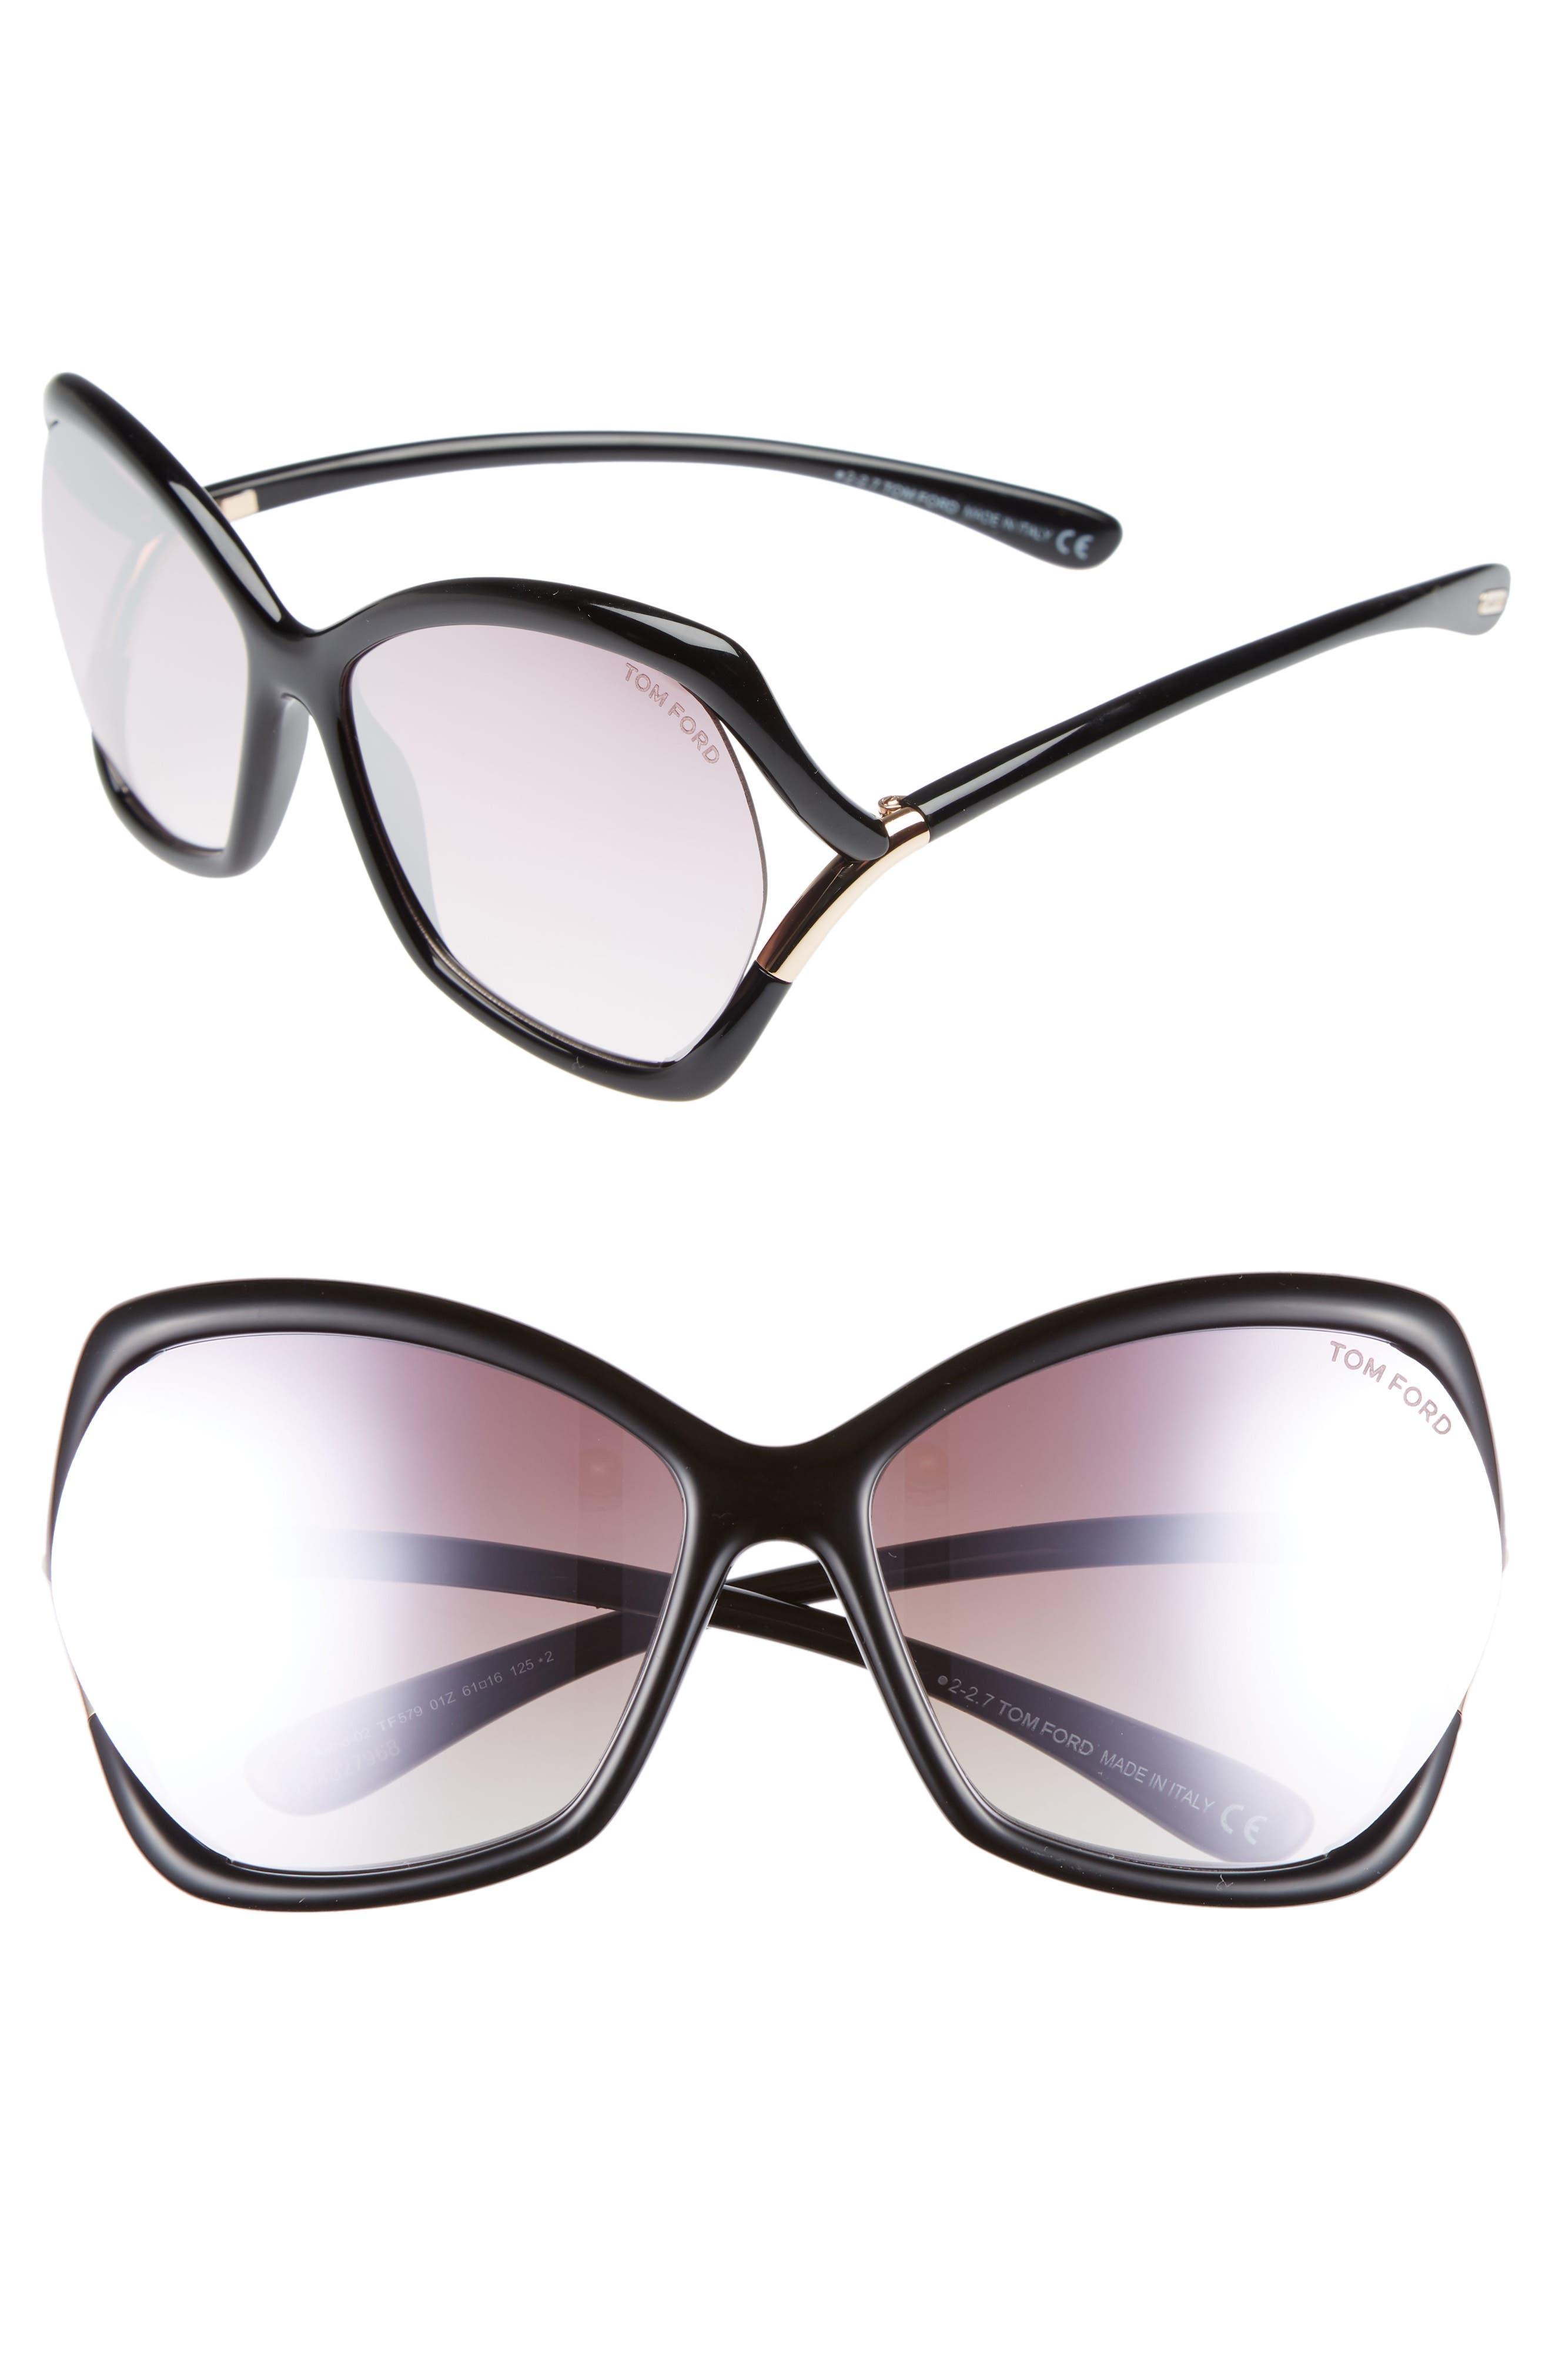 Astrid 61mm Geometric Sunglasses,                             Main thumbnail 1, color,                             Black/ Rose Gold/ Pink/ Silver